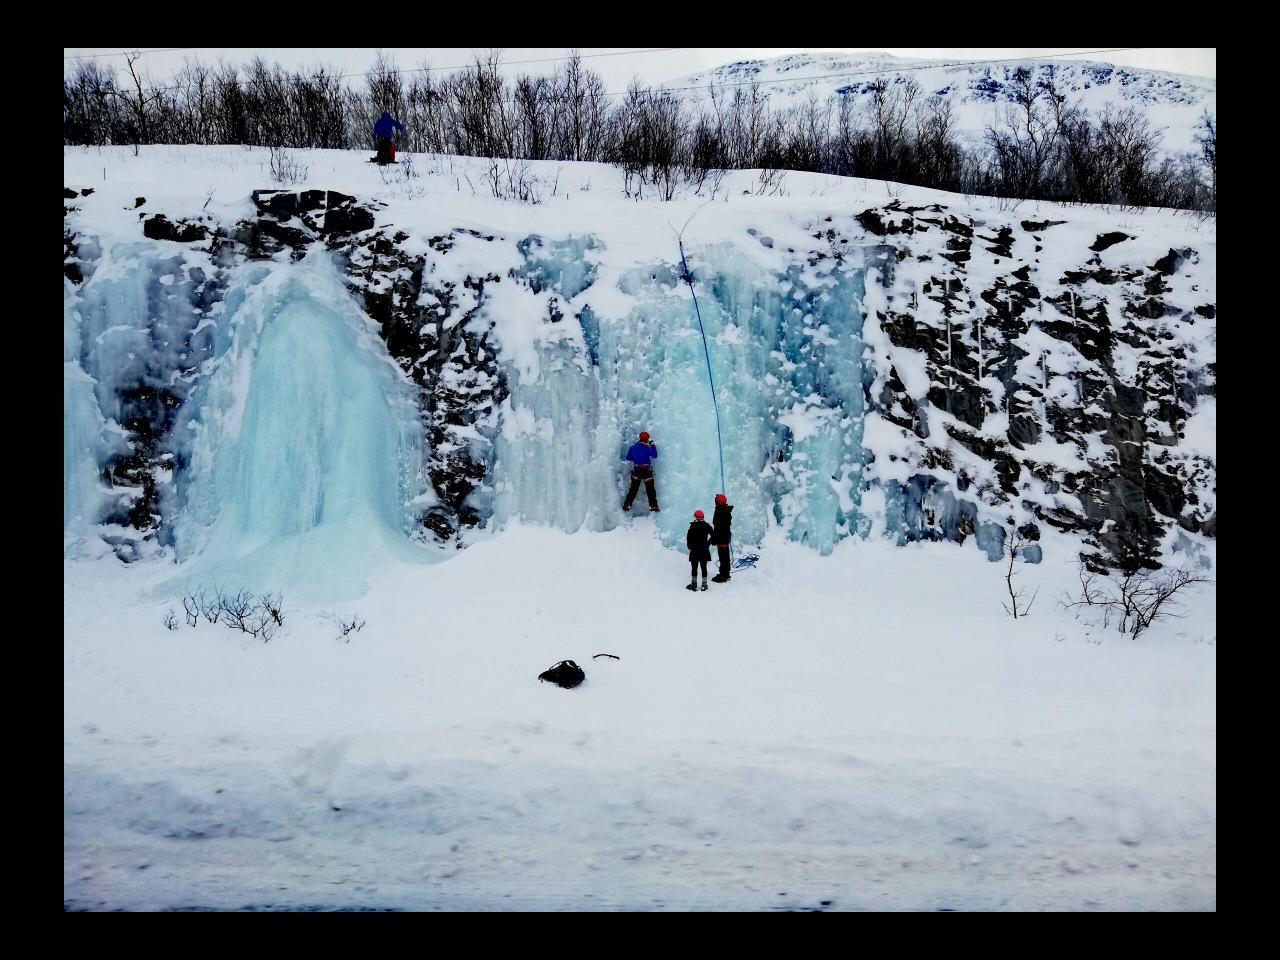 Eisklettern am Wasserfall in Abisko